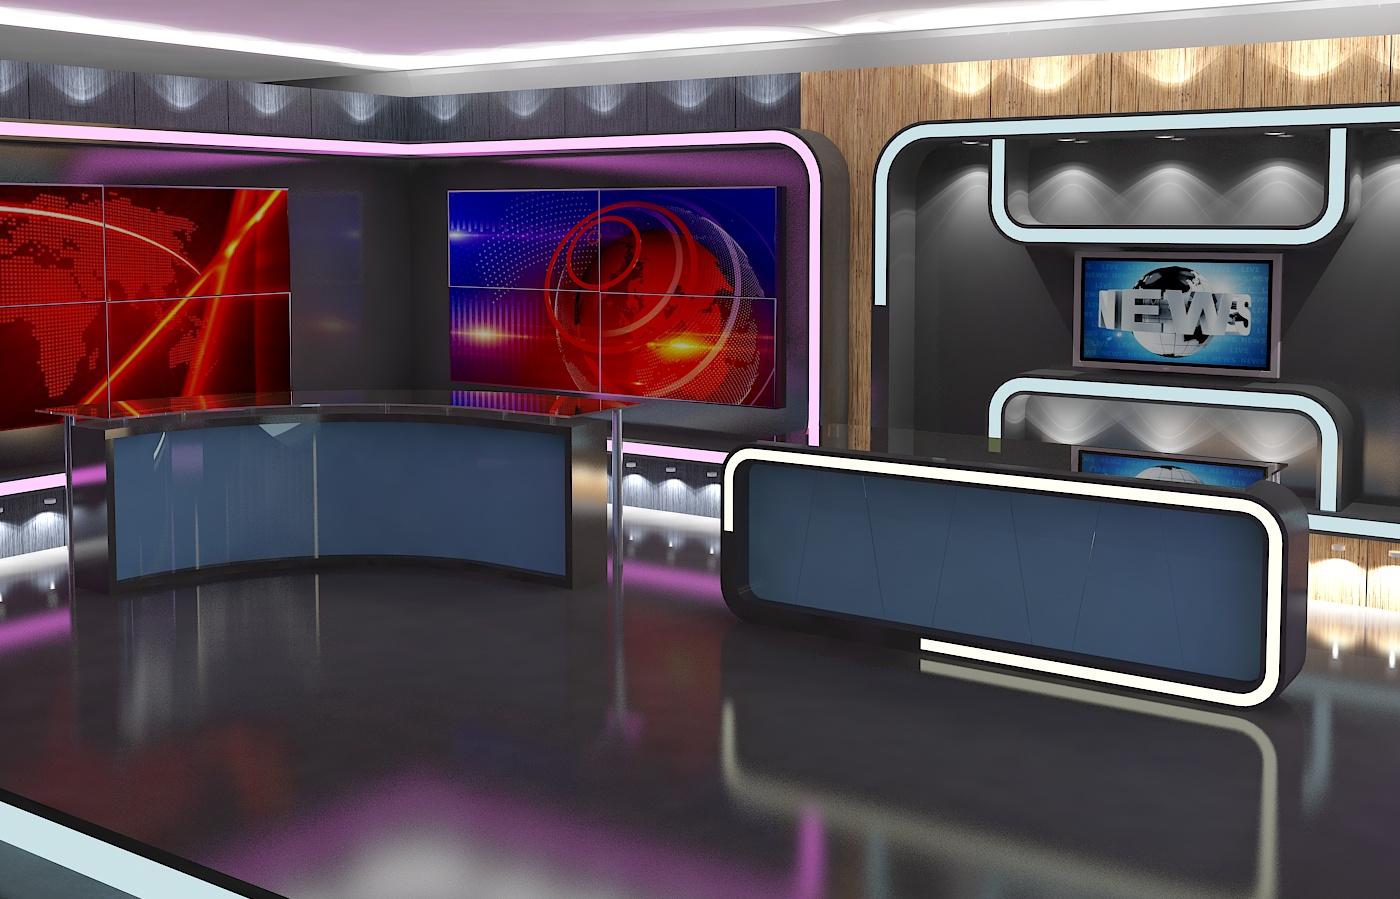 tv studio furniture.  Studio 3d Virtual TV Studio News Set 16 FlatPyramid Model 3ds Max Dxf Fbx Obj  For Tv Furniture